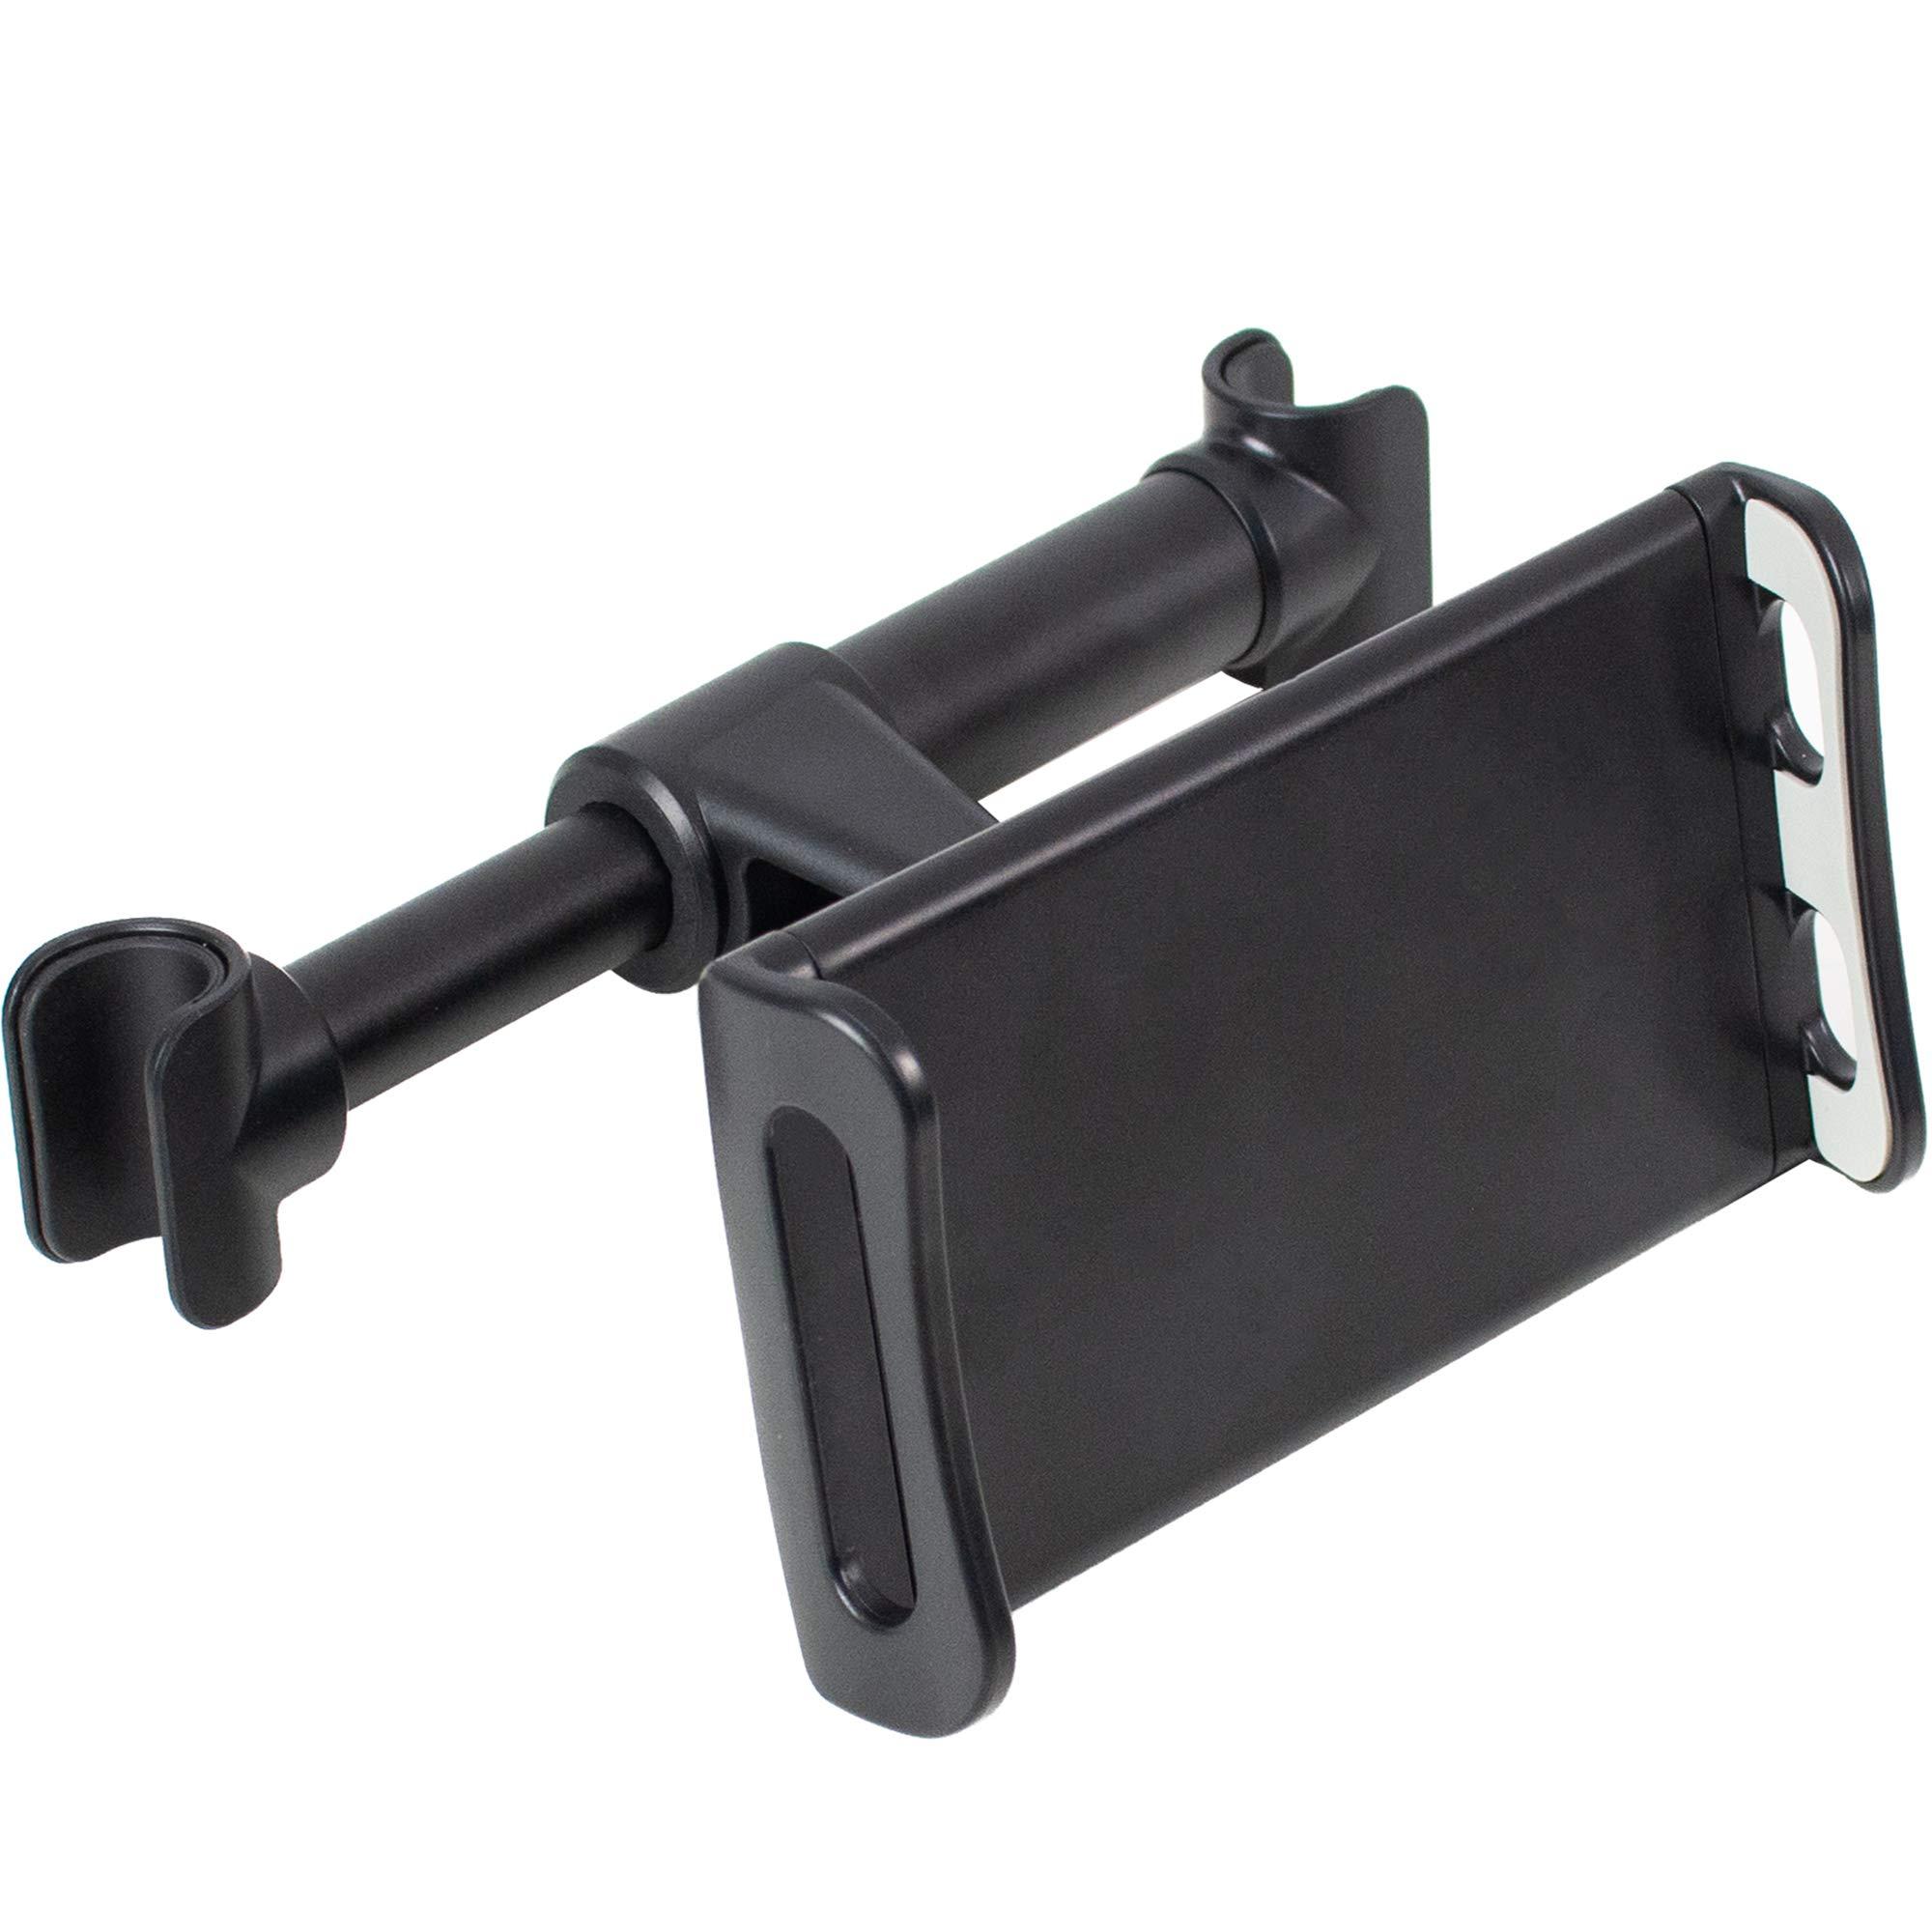 iPad Car Mount Tablet Headrest Holder for Car Back Seat ...